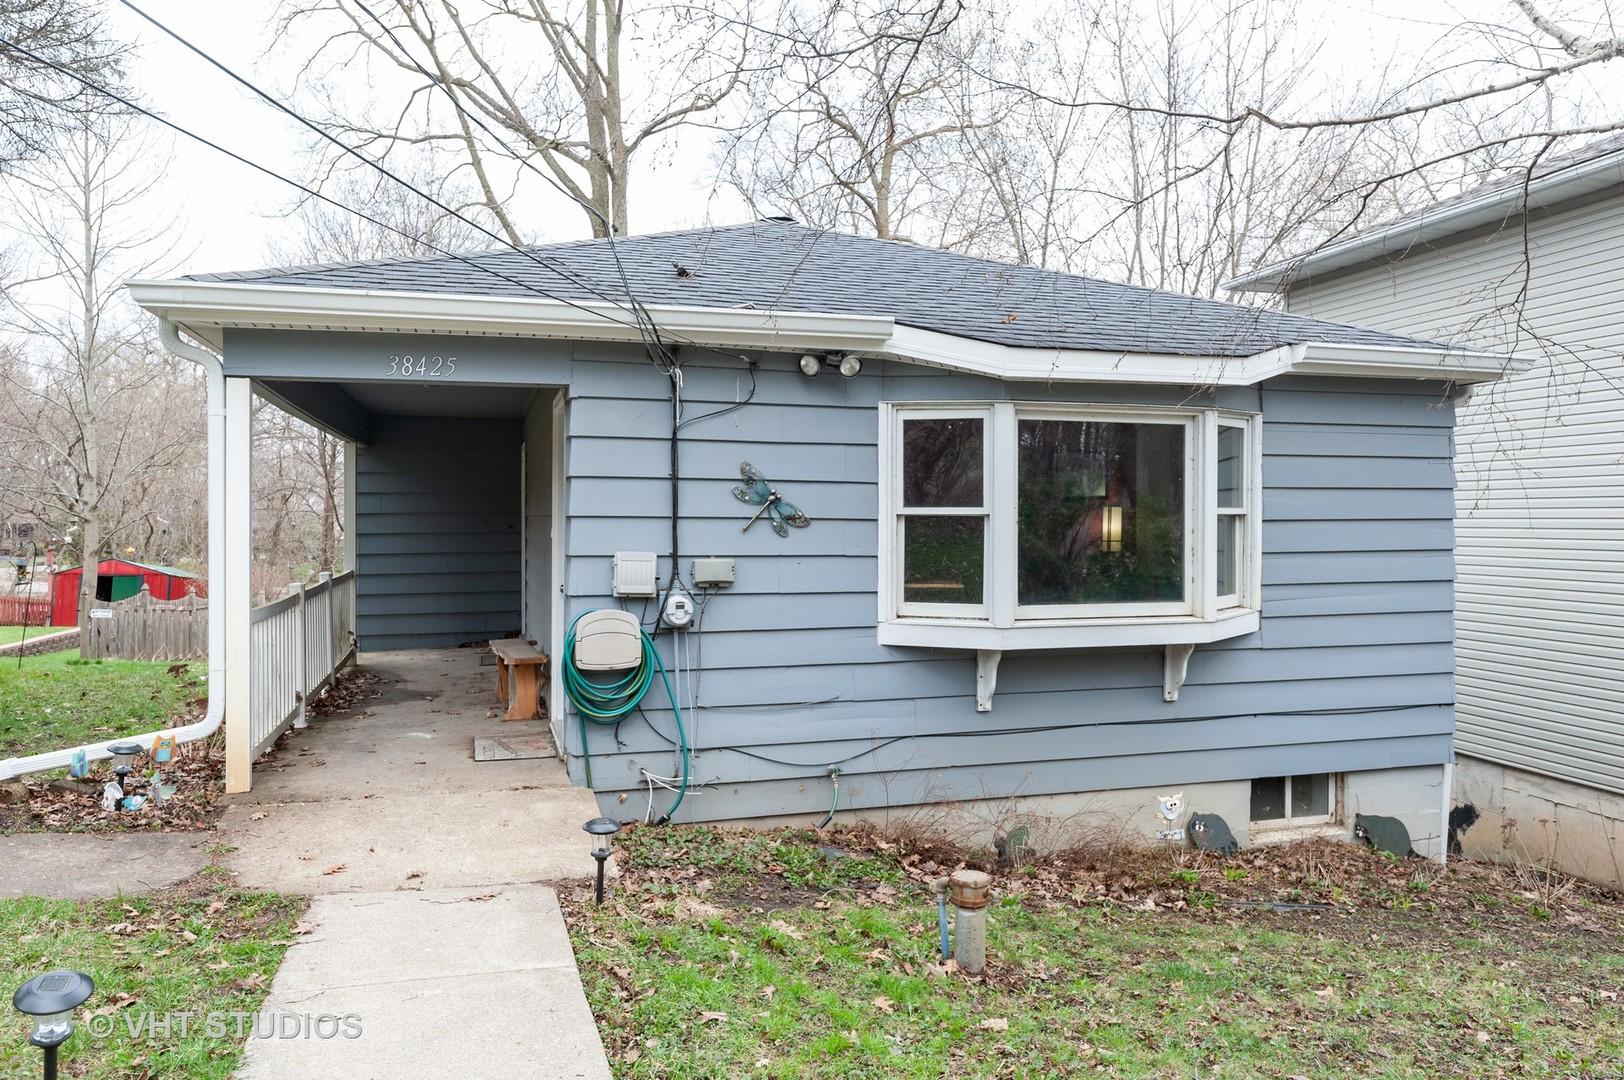 38425 North 3rd Avenue, Spring Grove, Illinois 60081